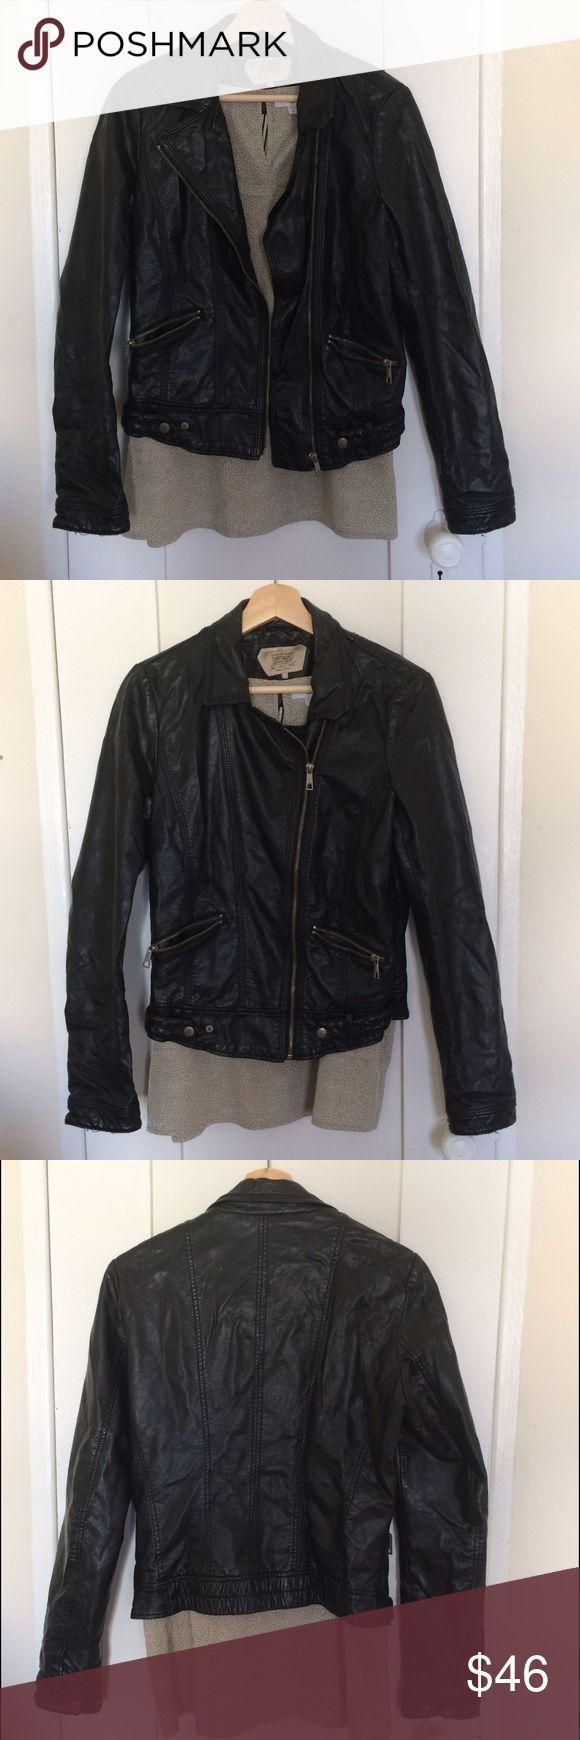 Zara Trafaluc Faux Leather Jacket Perfect weight, great biker jacket Zara Jackets & Coats Utility Jackets